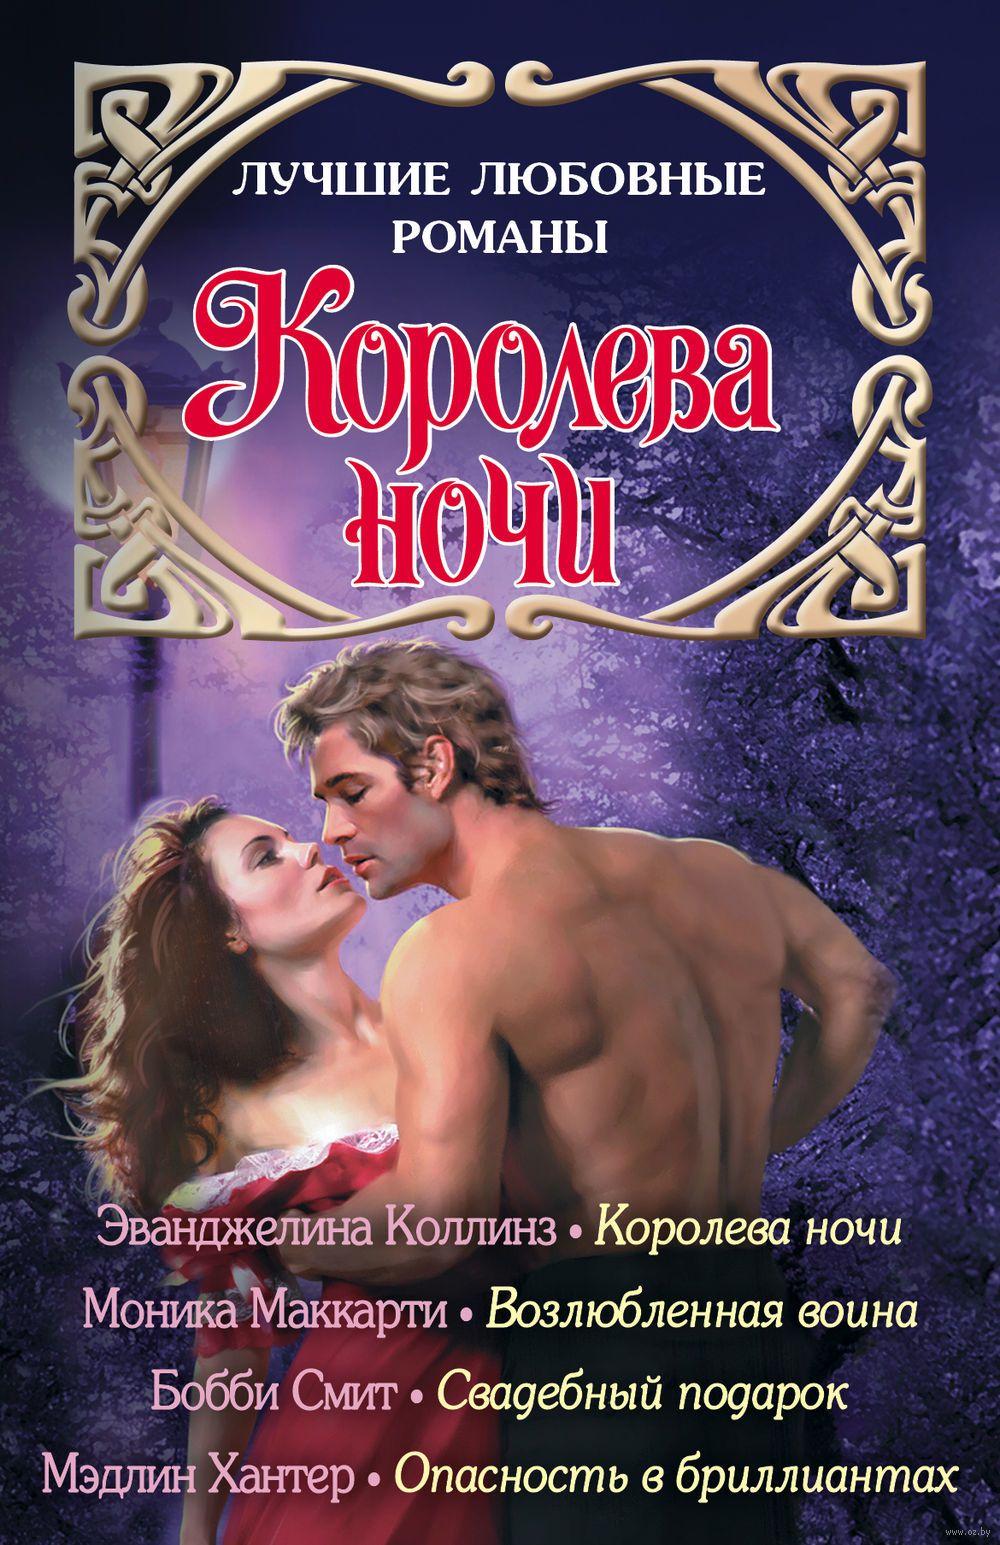 chitat-lyubovnie-romani-gei